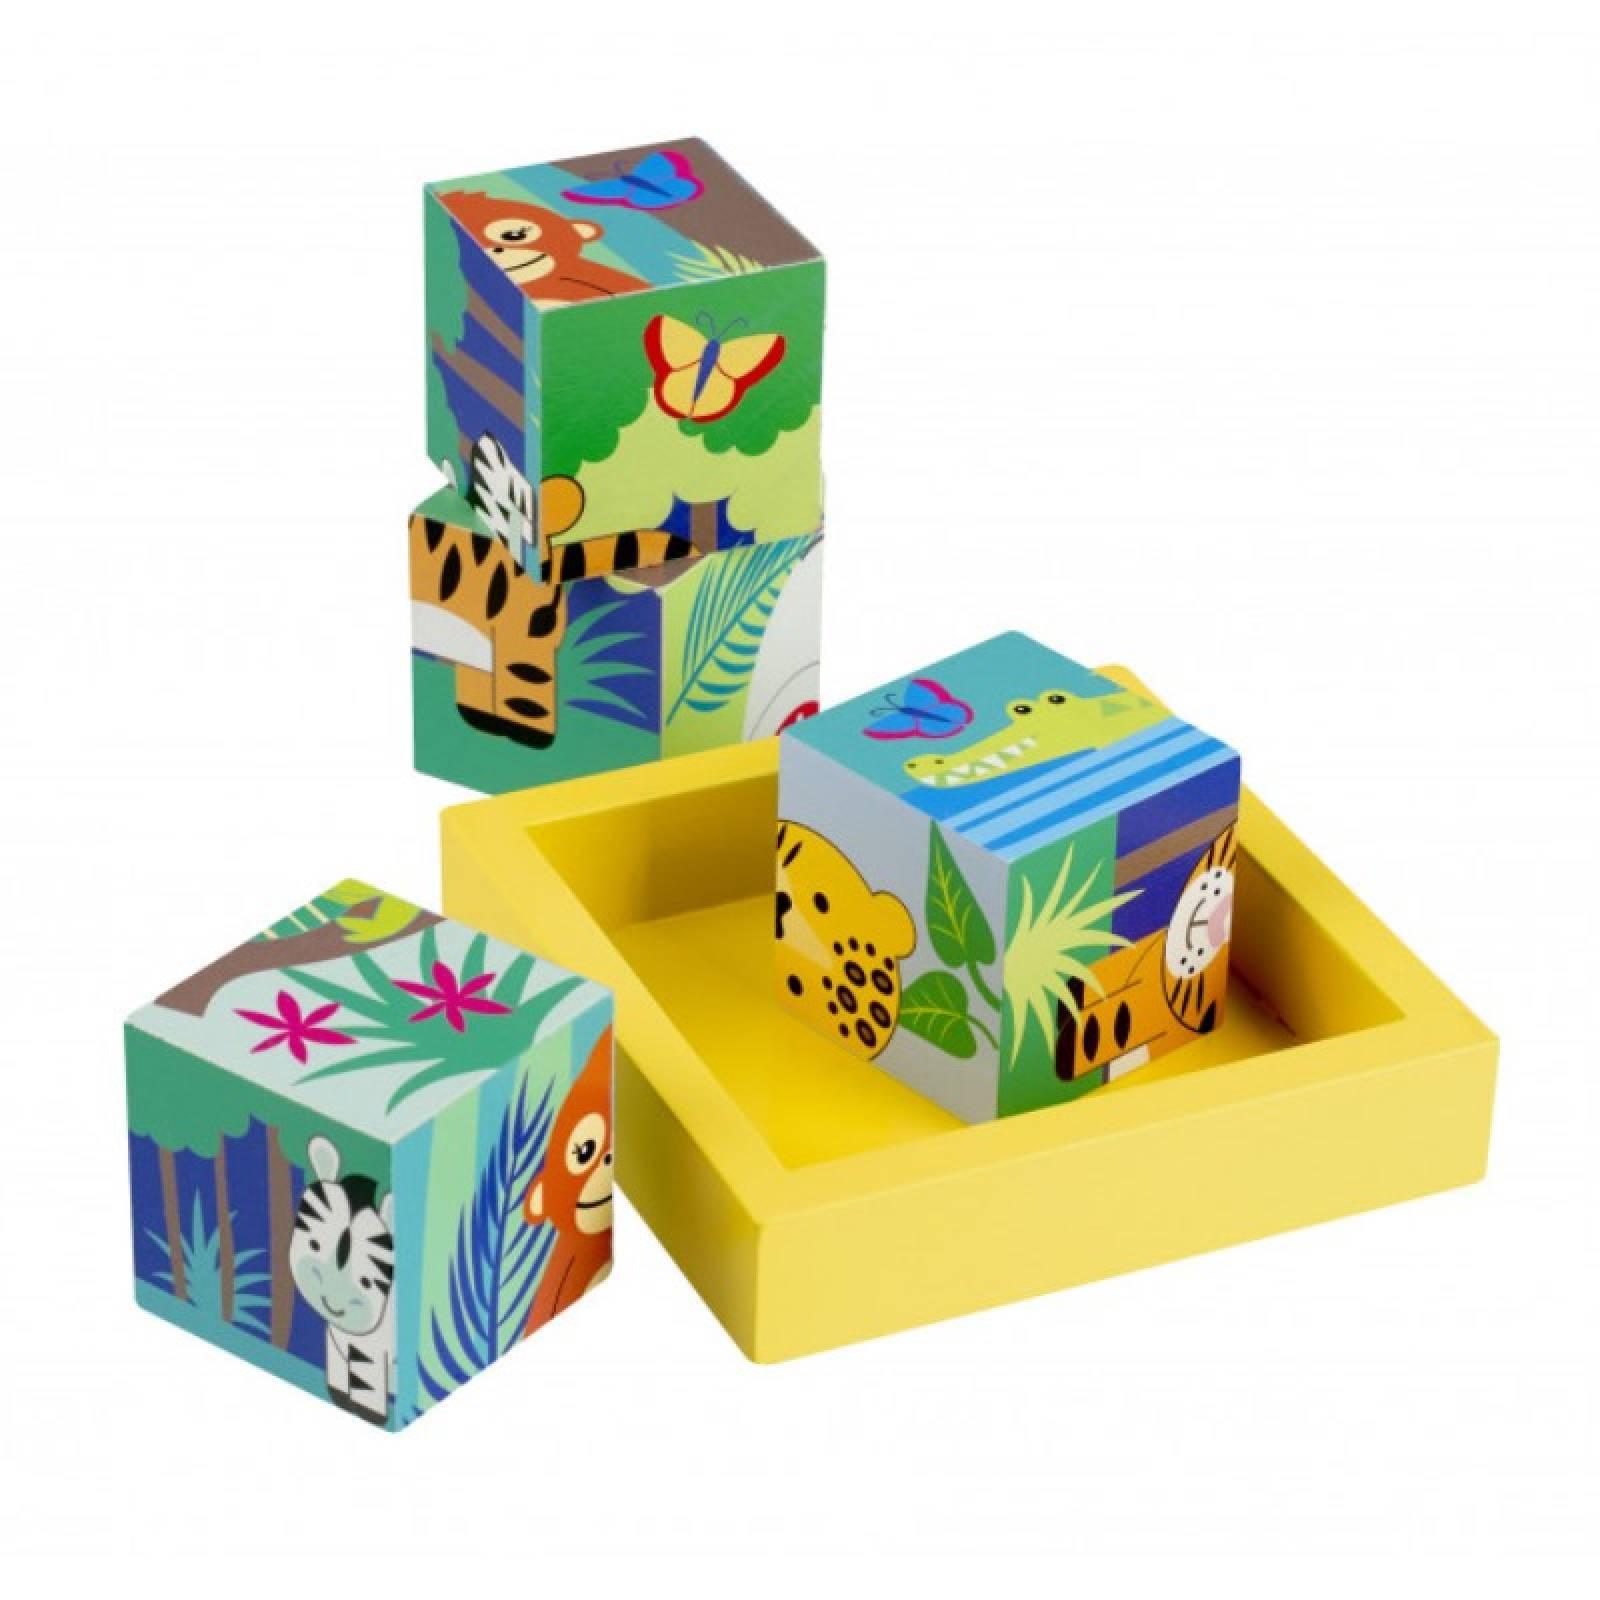 Jungle Animals Wooden Blocks In Tray By Orange Tree 1+ thumbnails